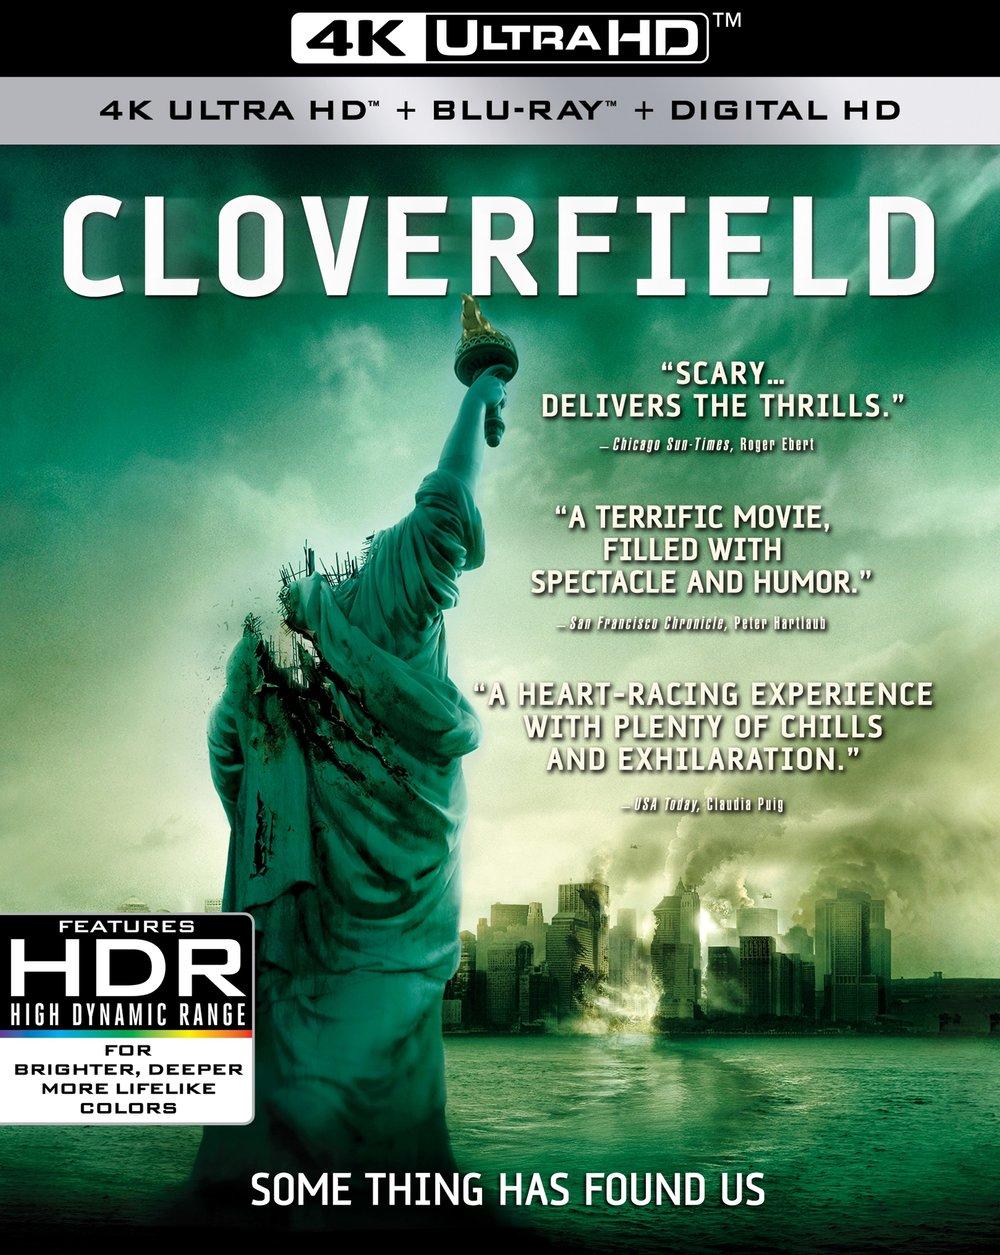 Cloverfield_4K_UHD_Front.jpg